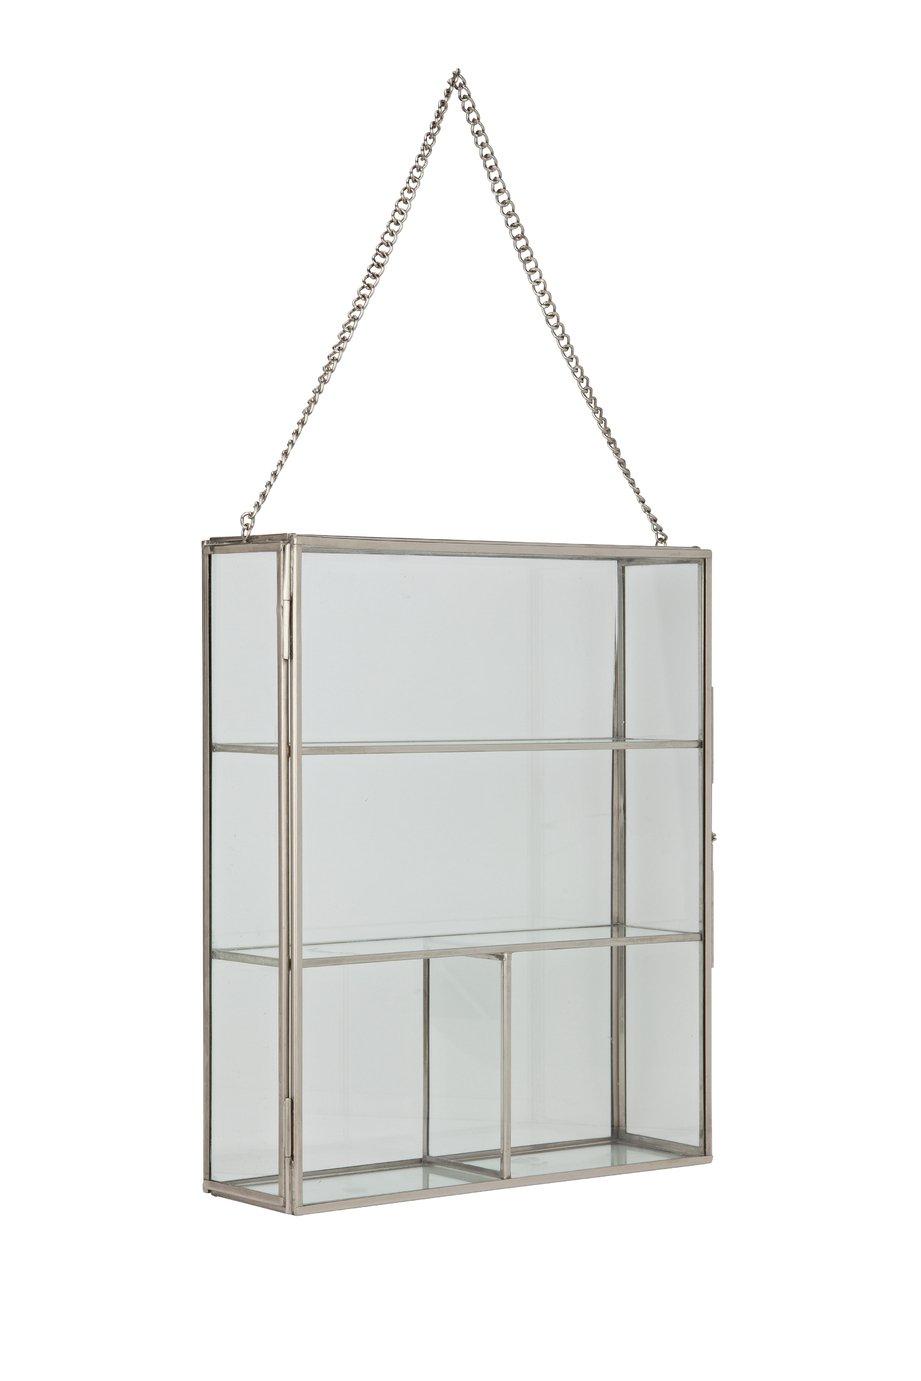 Argos Home Glass Shelving Unit - Brass